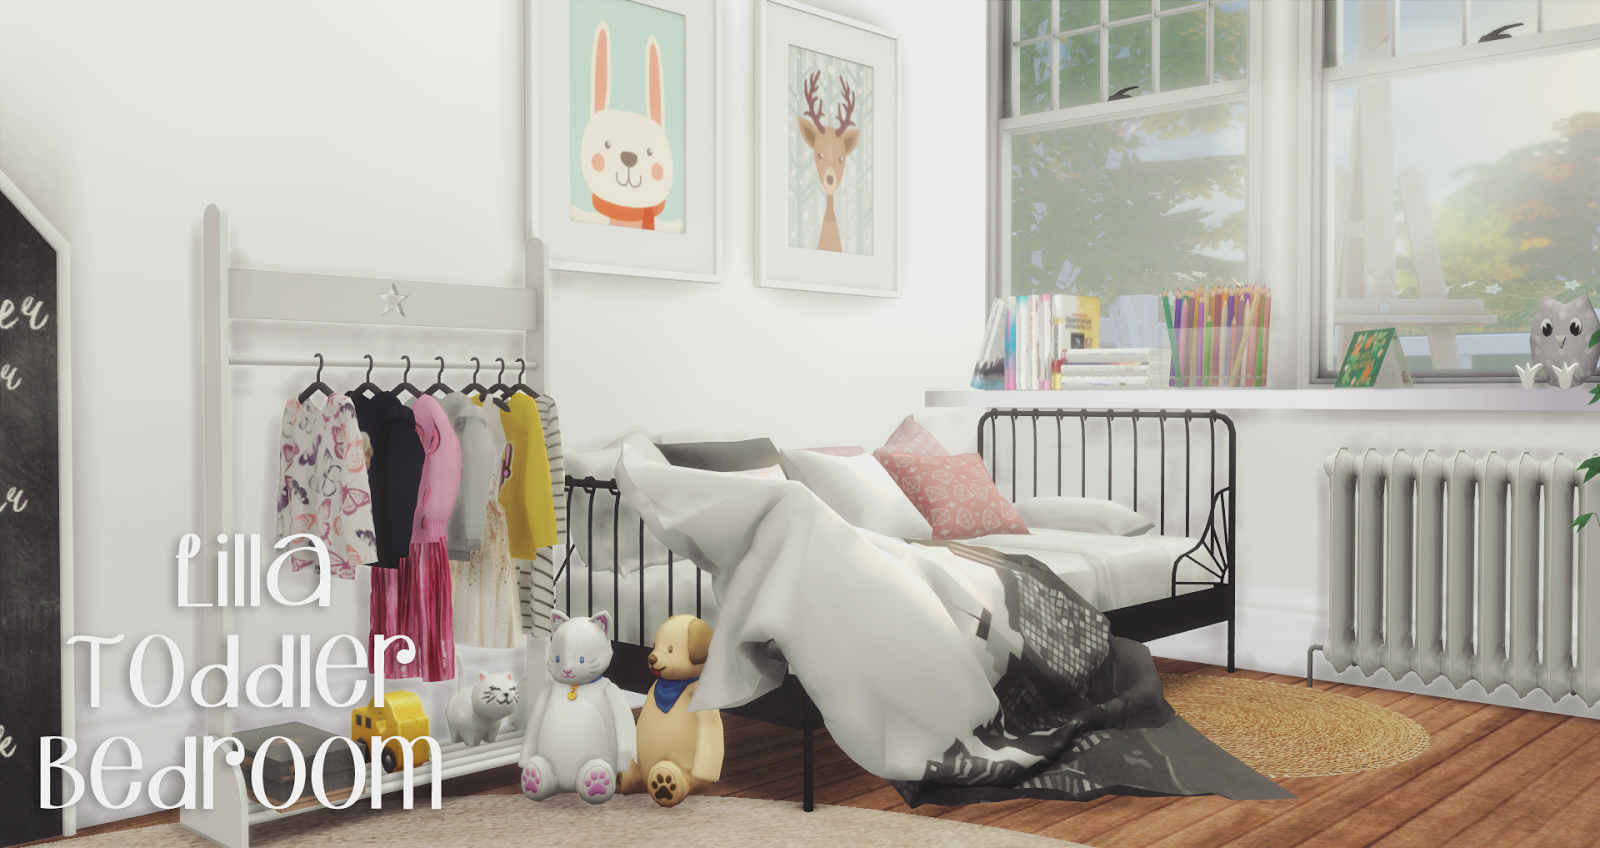 Lilla Toddler Bedroom *NEW SET*